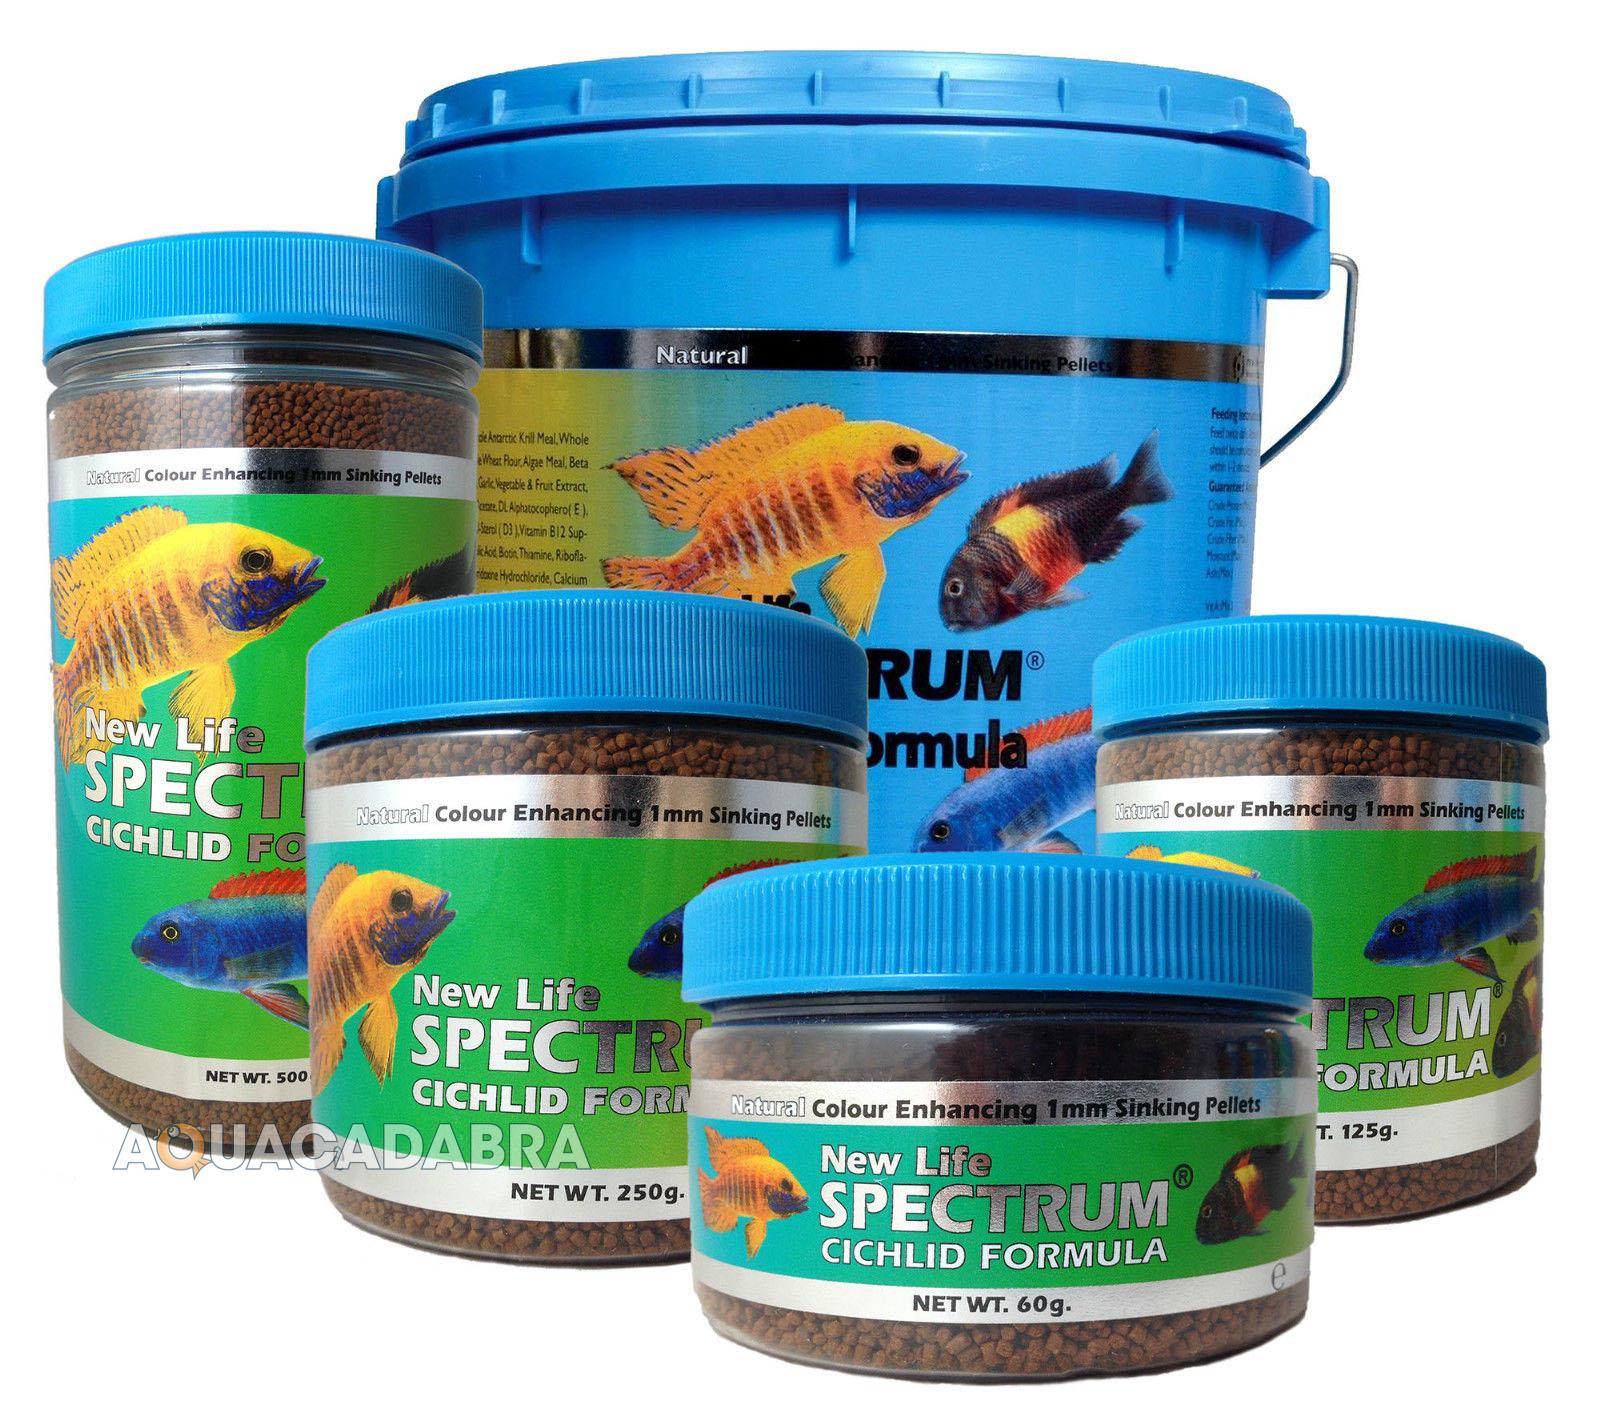 New life spectrum cichlid formula fish food 1mm sinking for New life spectrum fish food